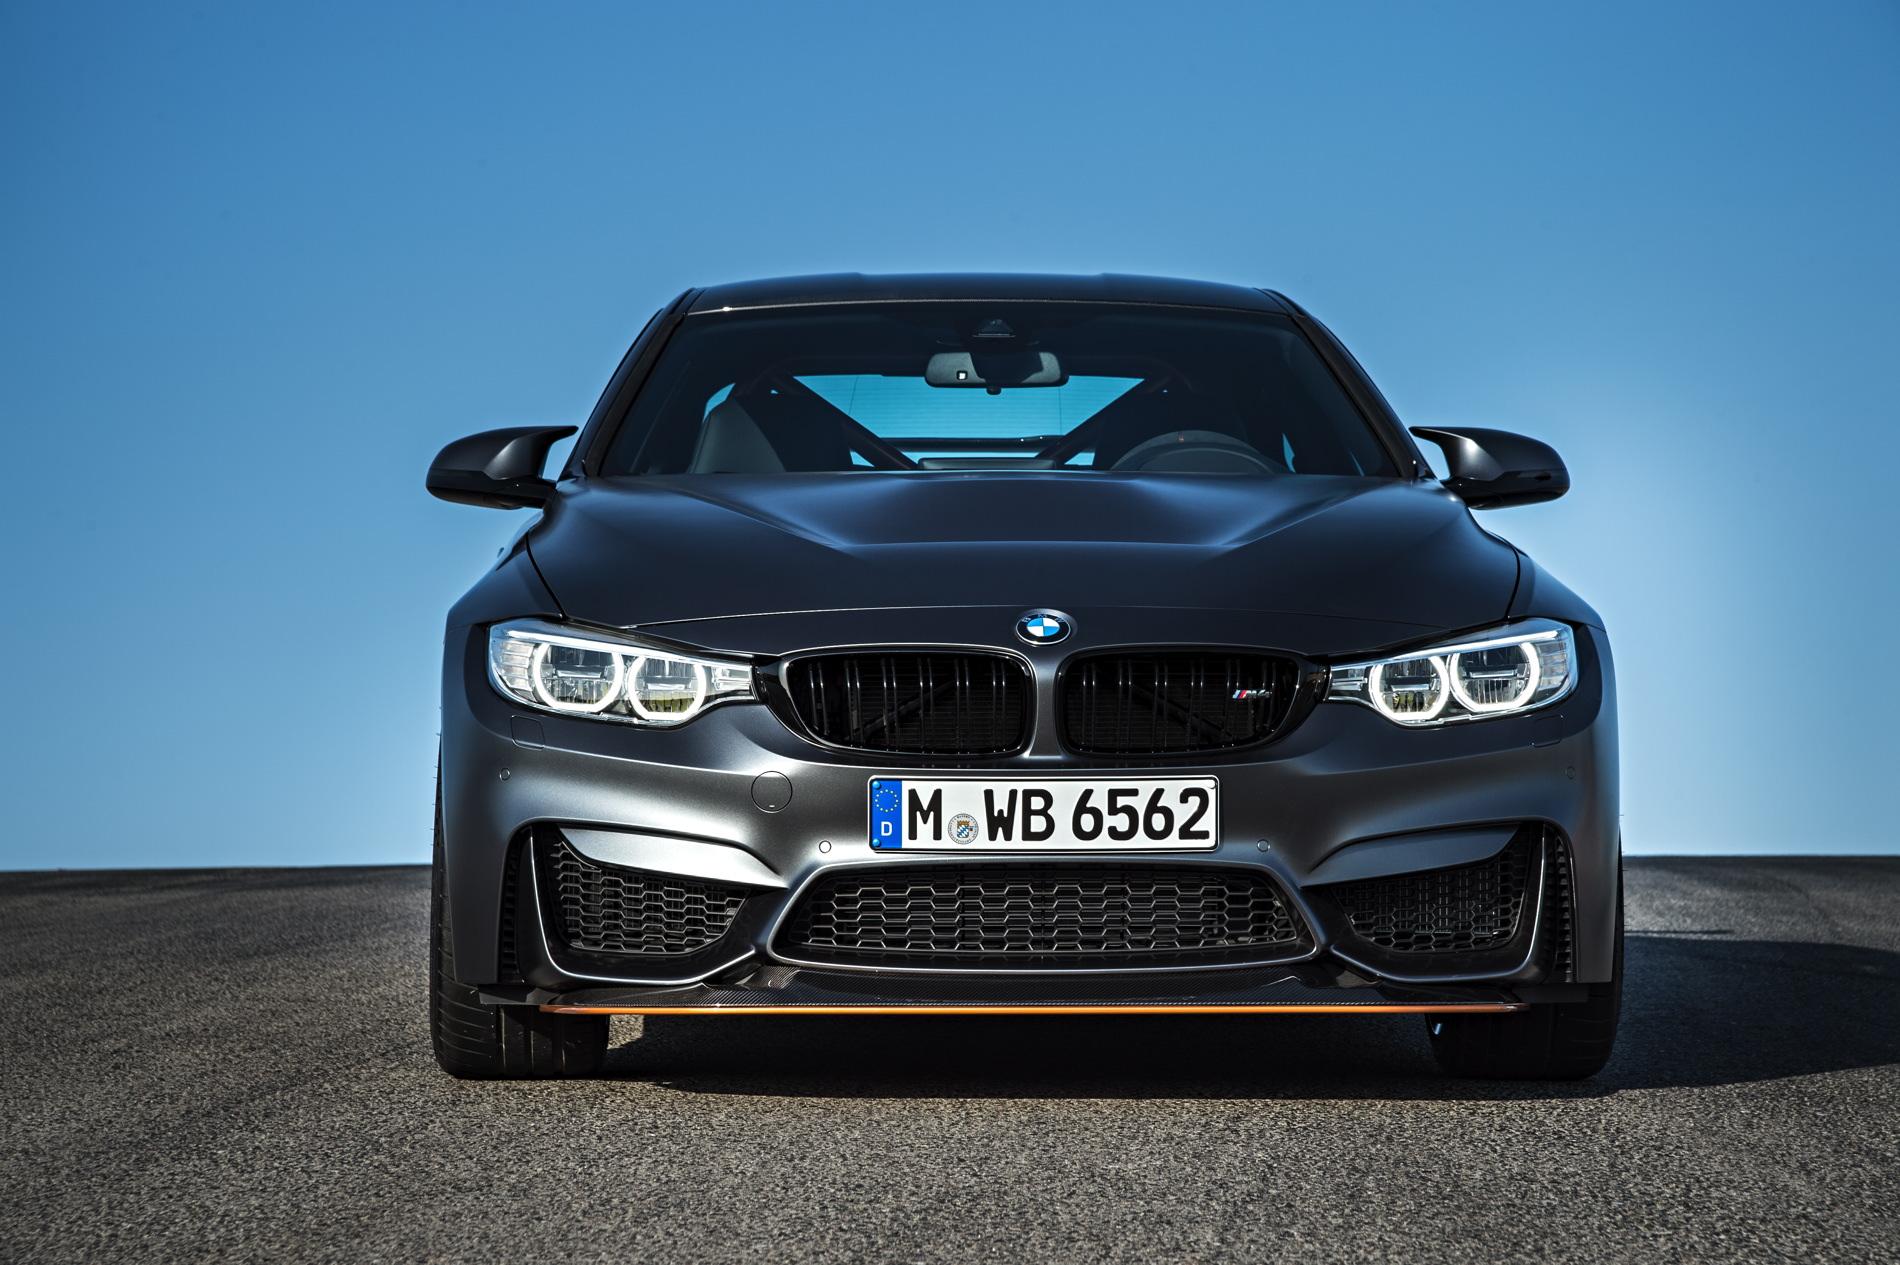 2016 BMW M4 GTS images 1900x1200 wallpaper 13